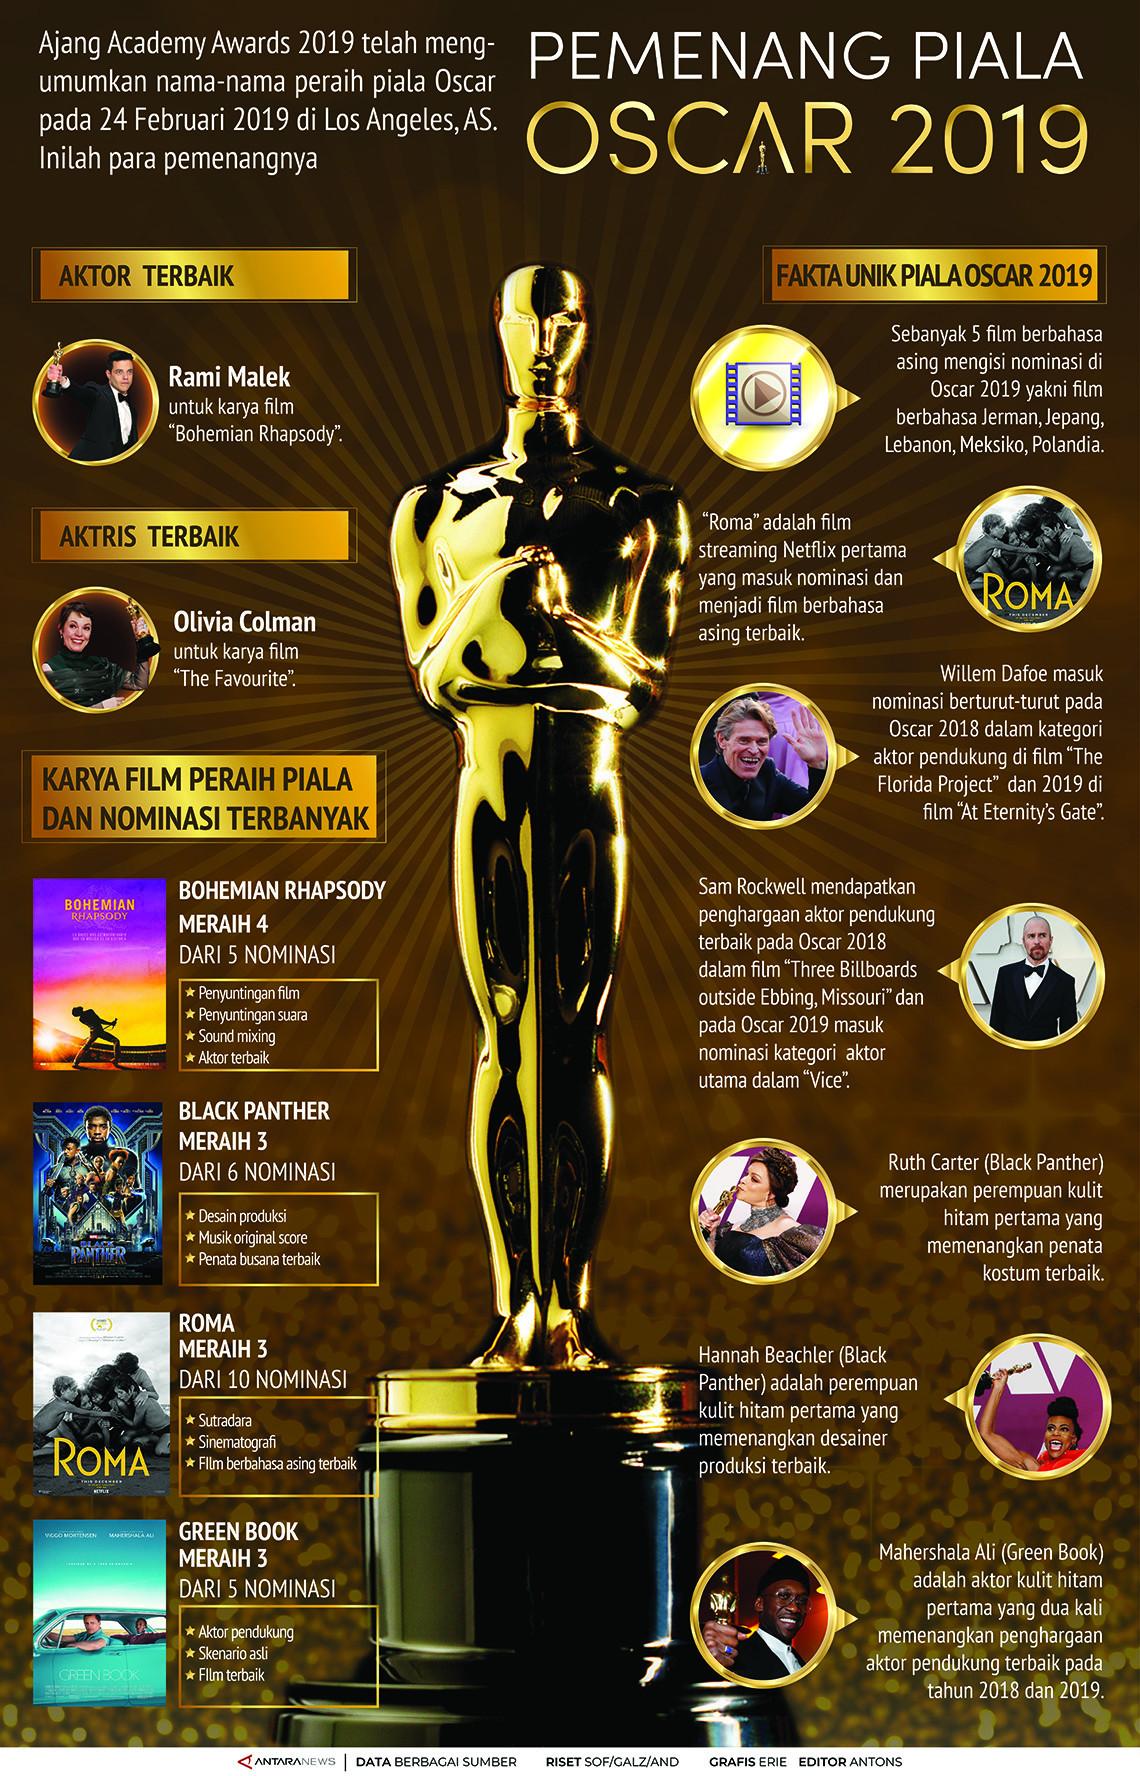 Pemenang Piala Oscar 2019